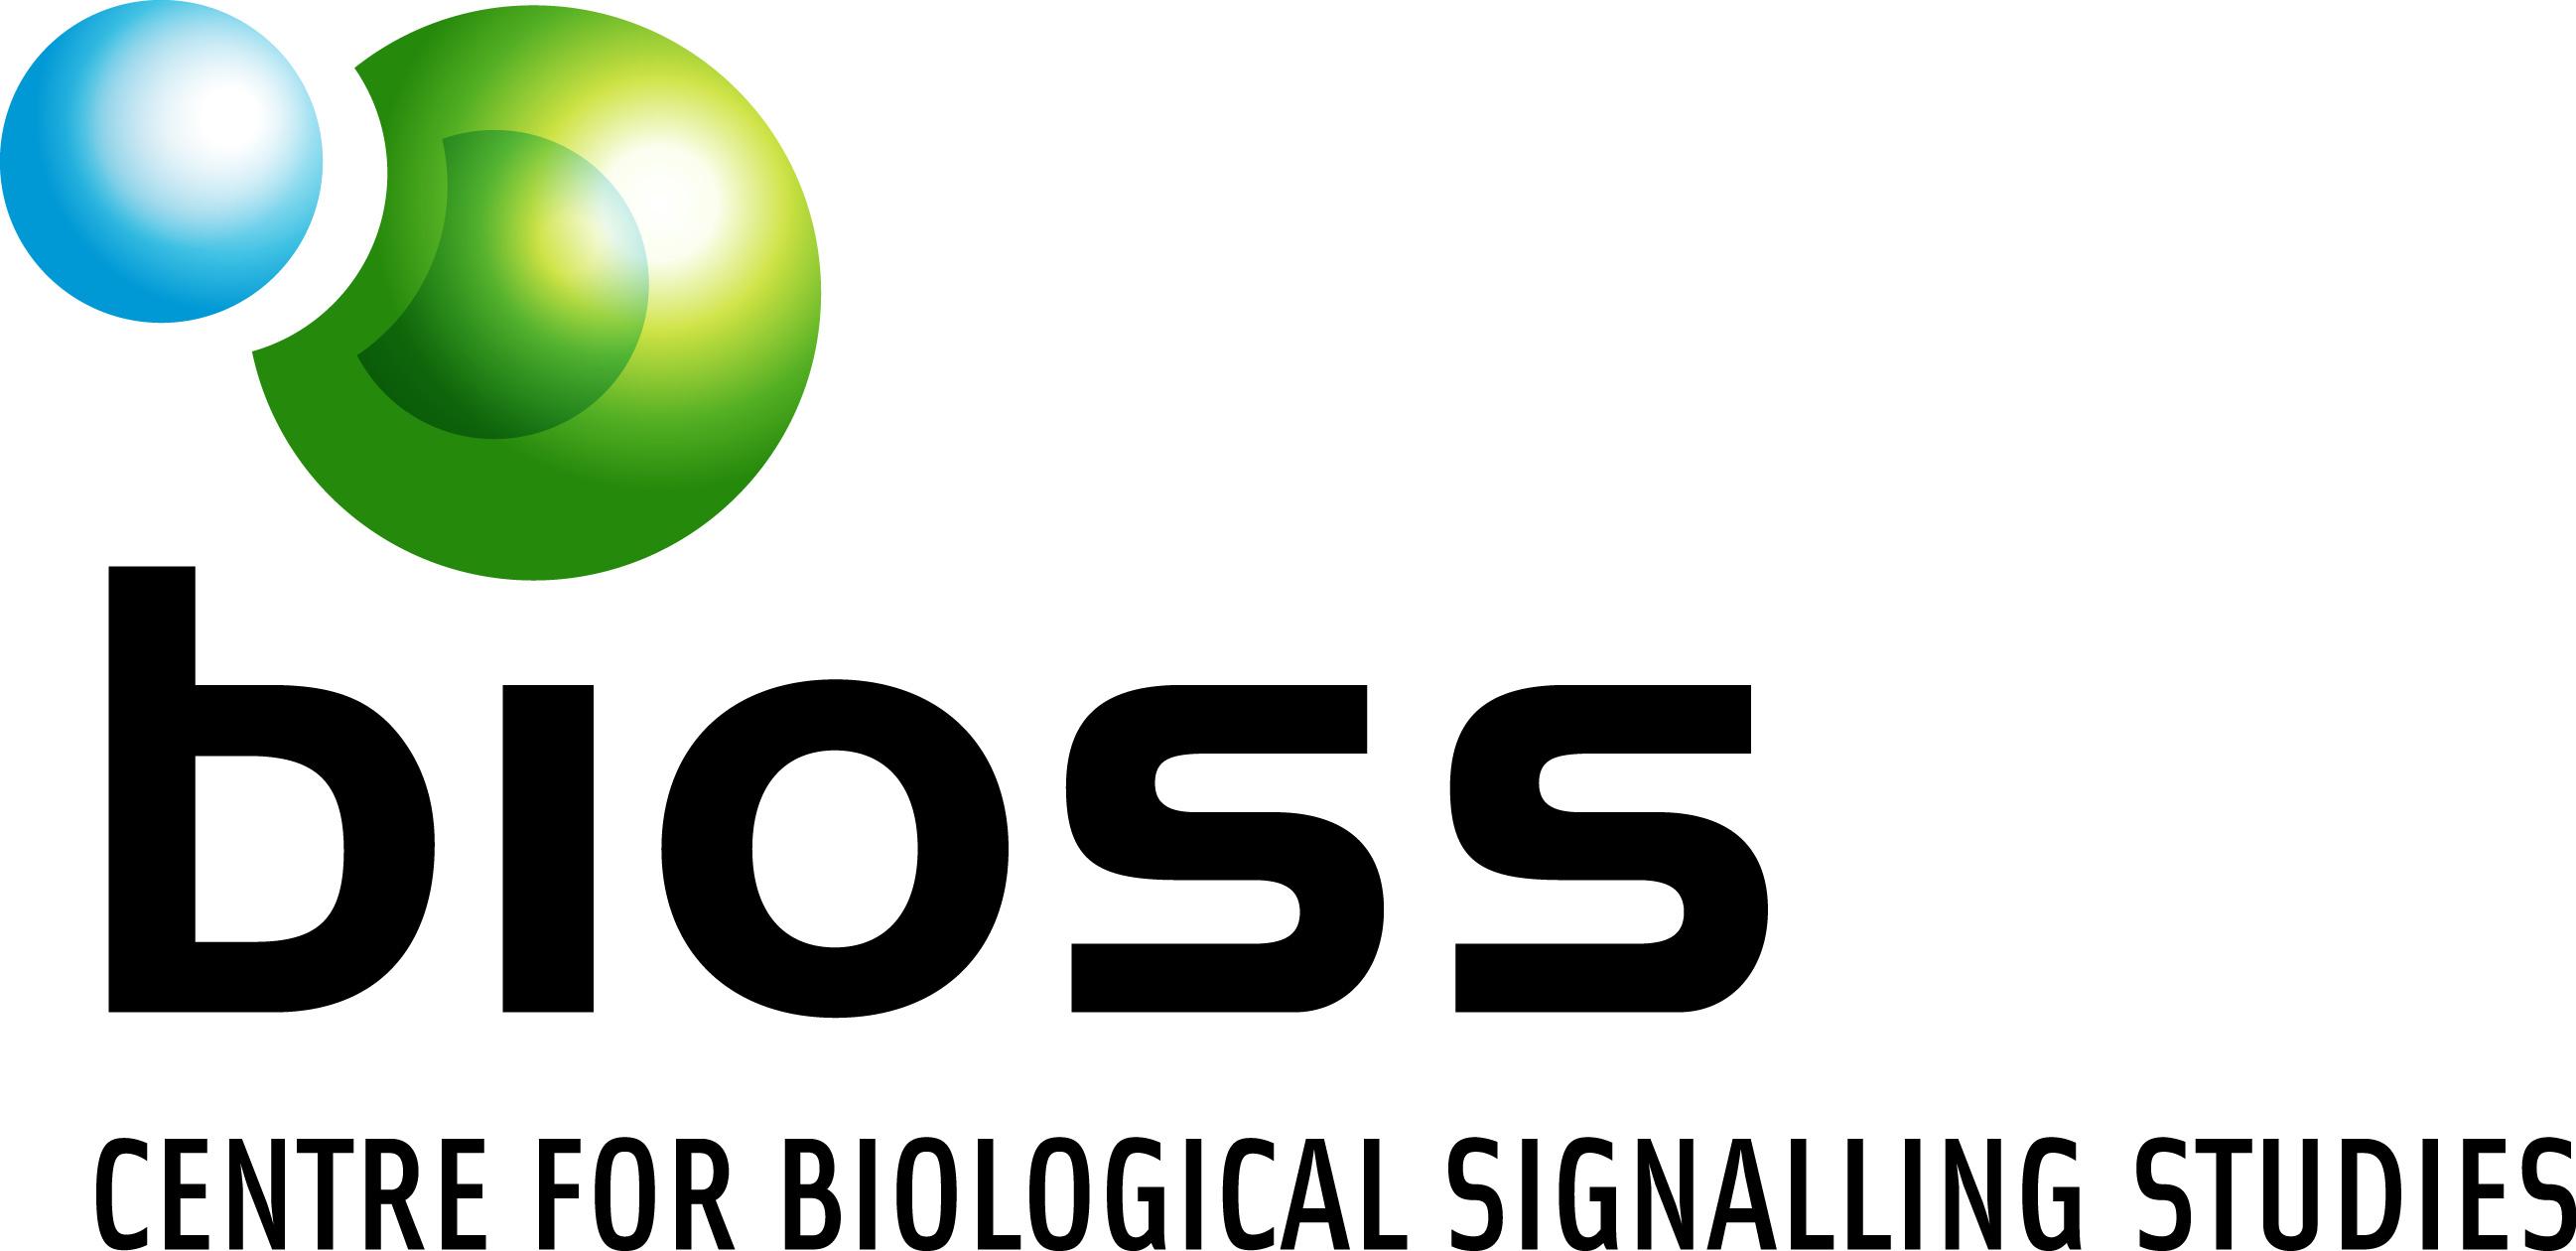 BiossLogo.jpg